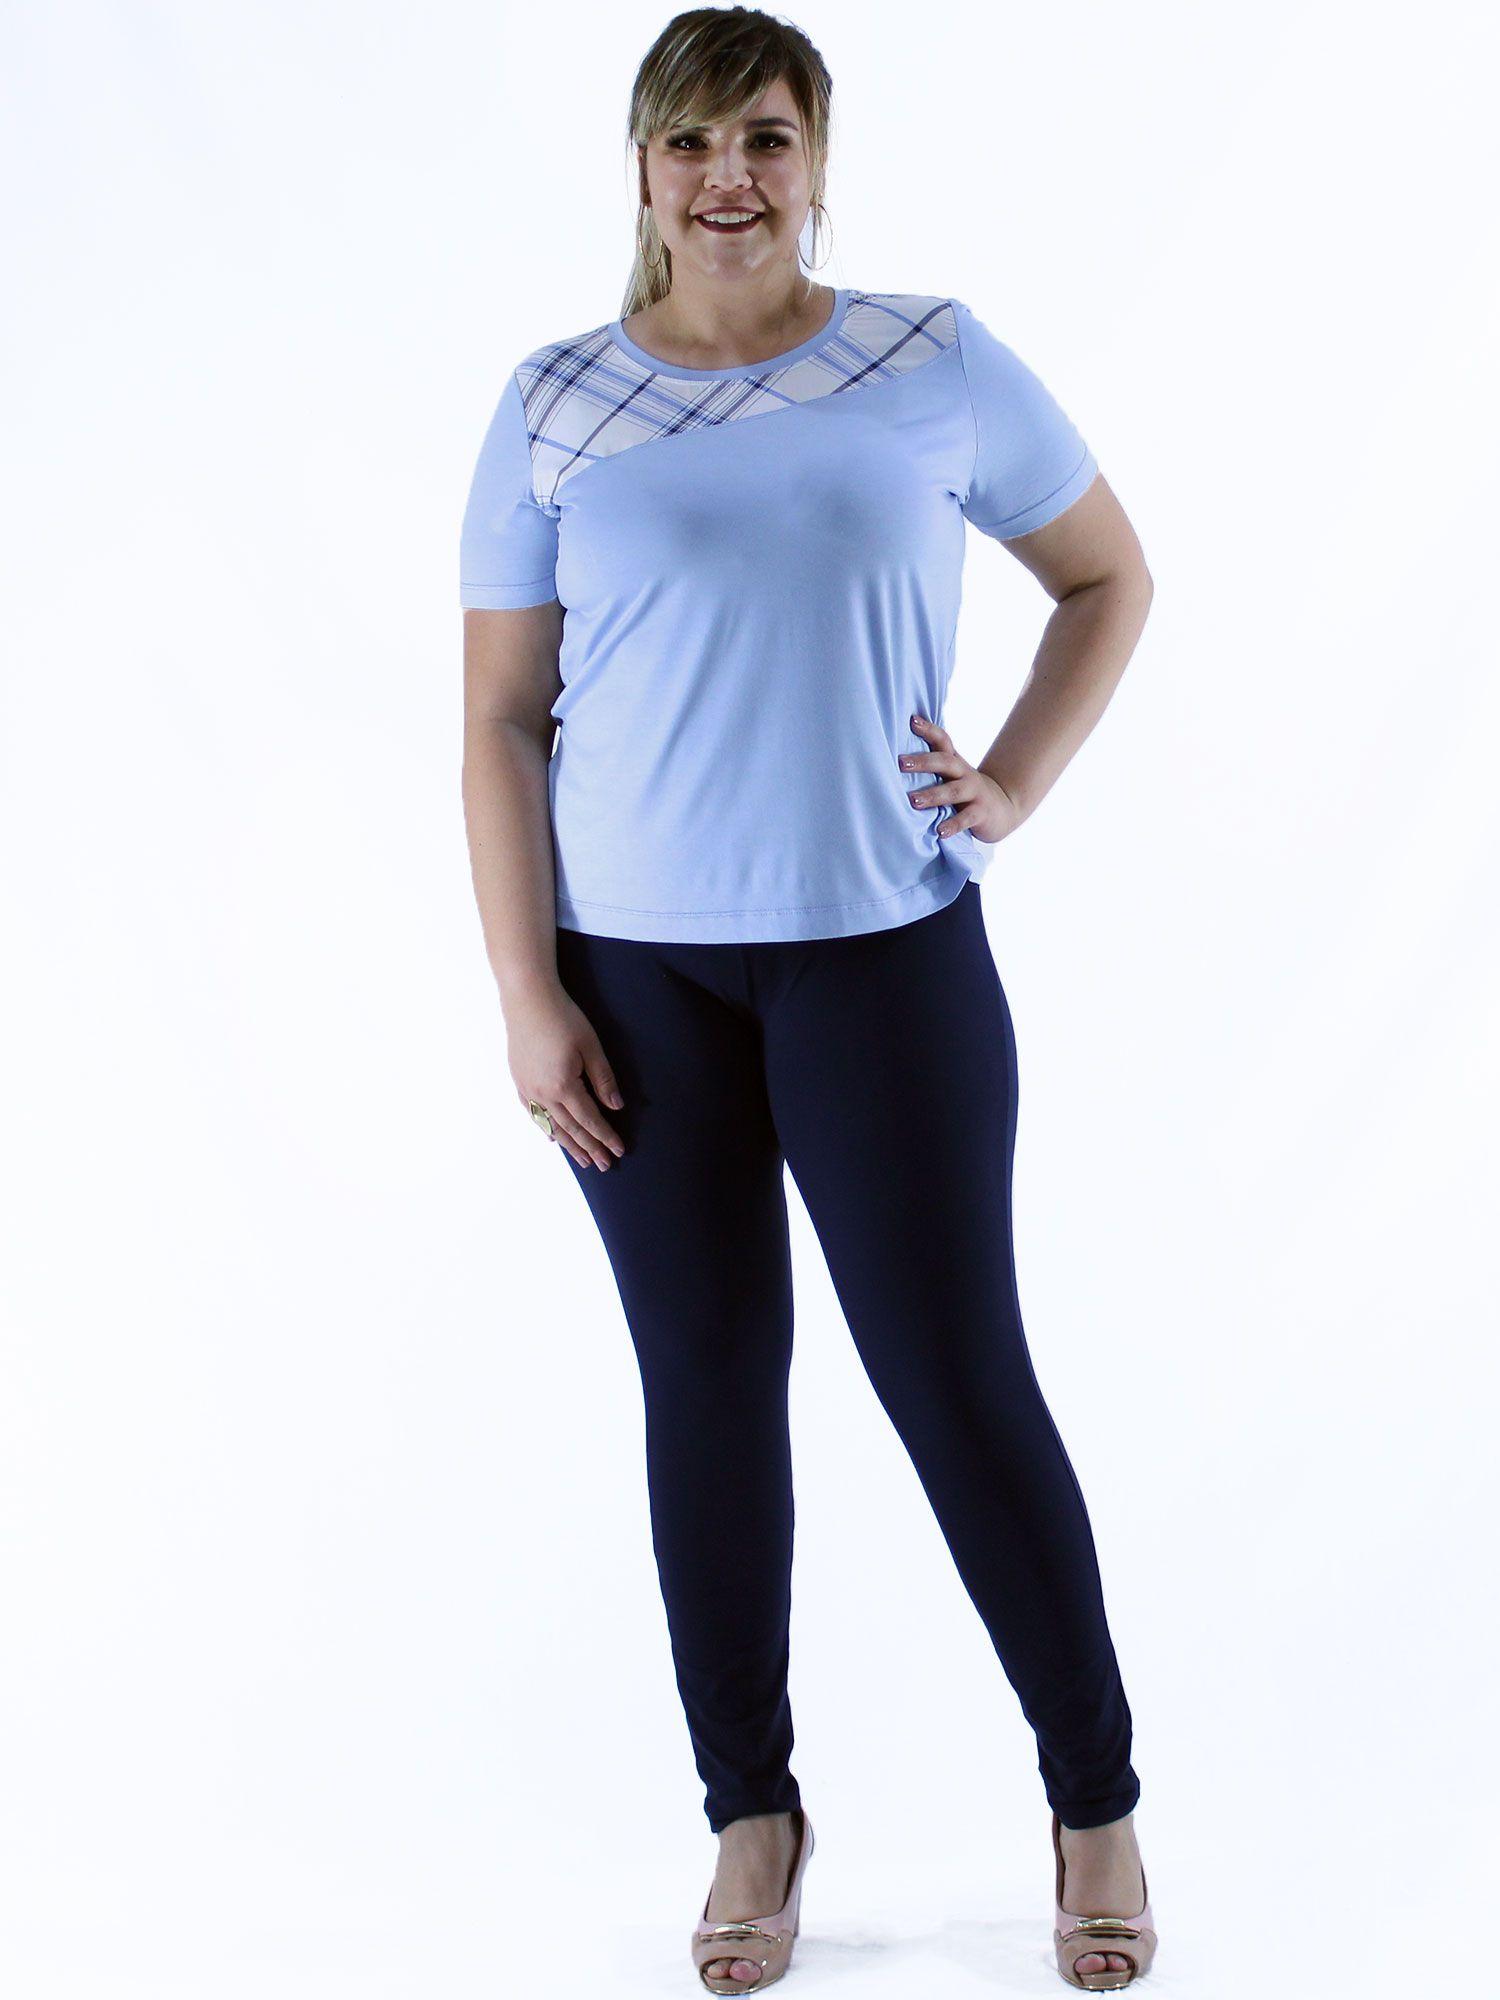 Blusa Plus Size KTS com Pala Contraste Azul